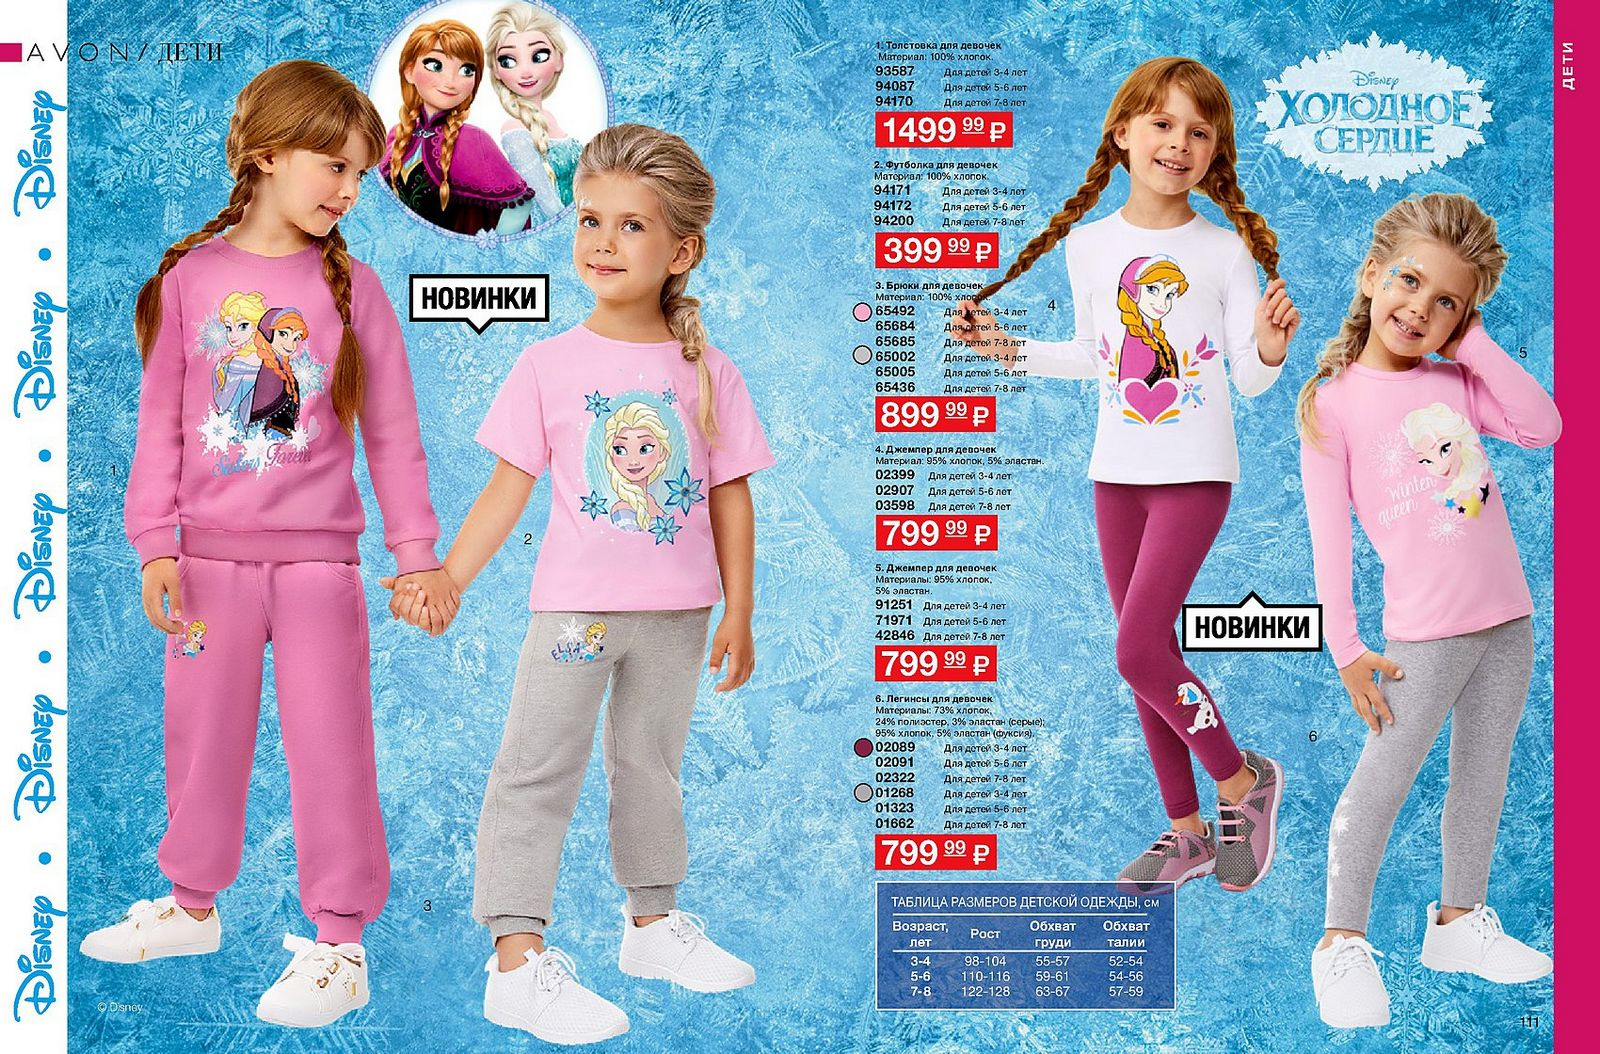 avon одежда для детей